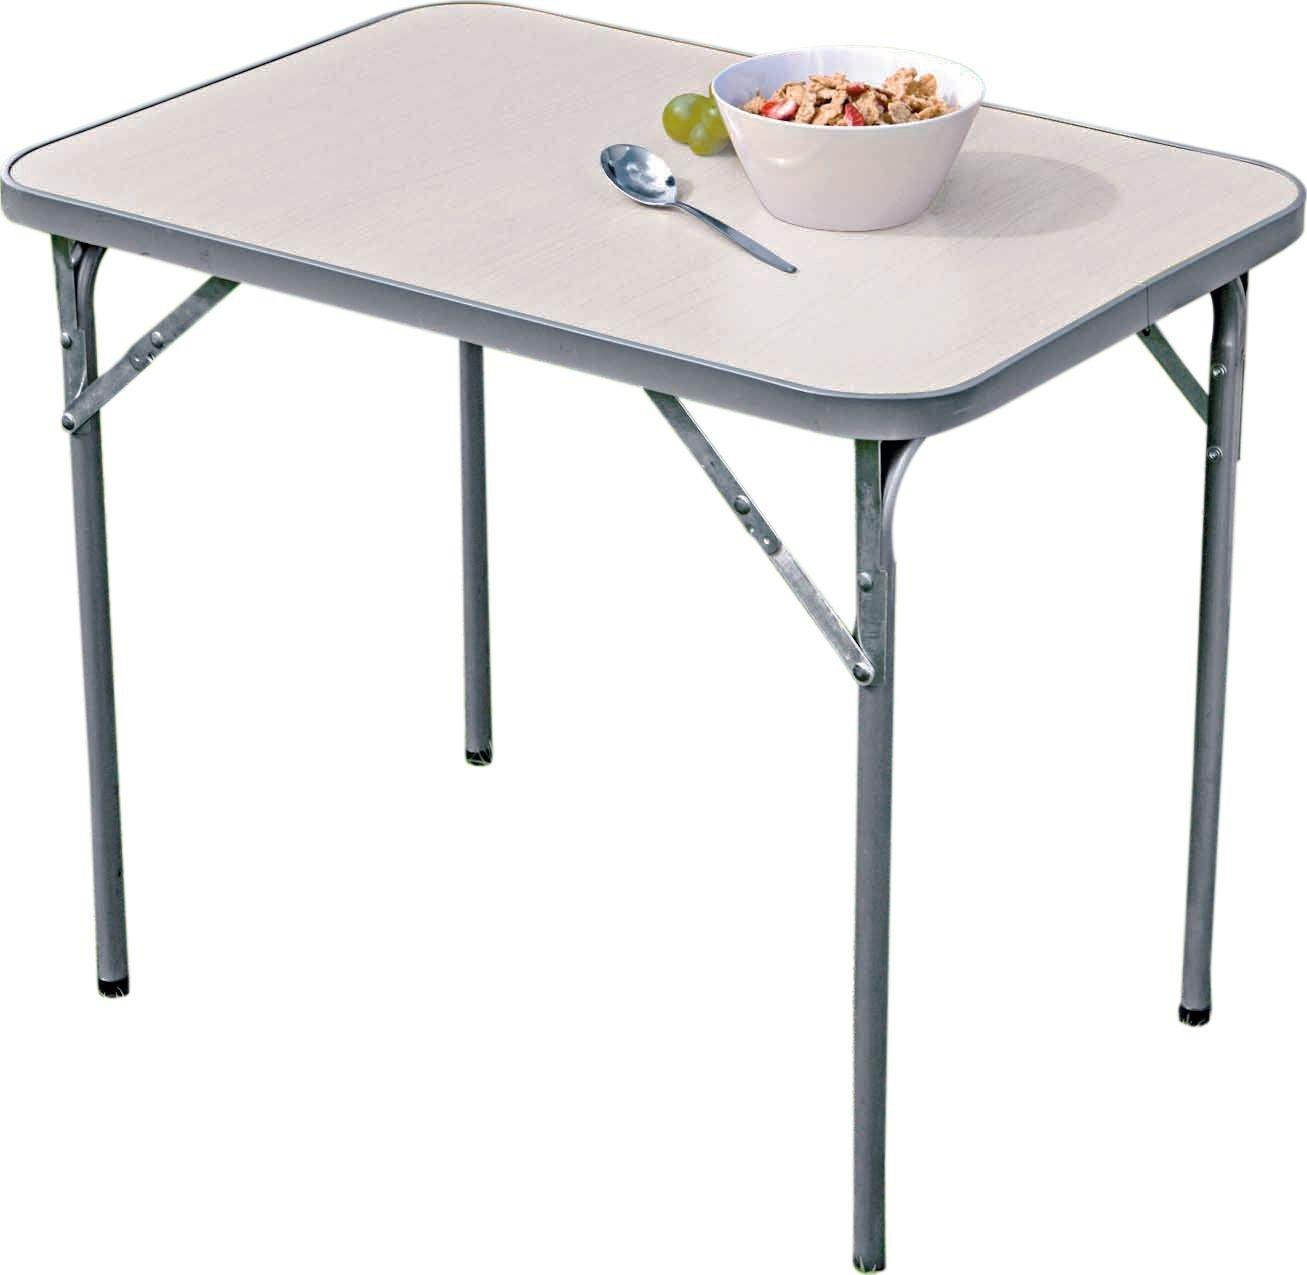 Buy Folding Camping Table at Argoscouk Your Online  : 3400298RZ001AUC545872Webampw570amph513 from www.argos.co.uk size 570 x 513 jpeg 22kB